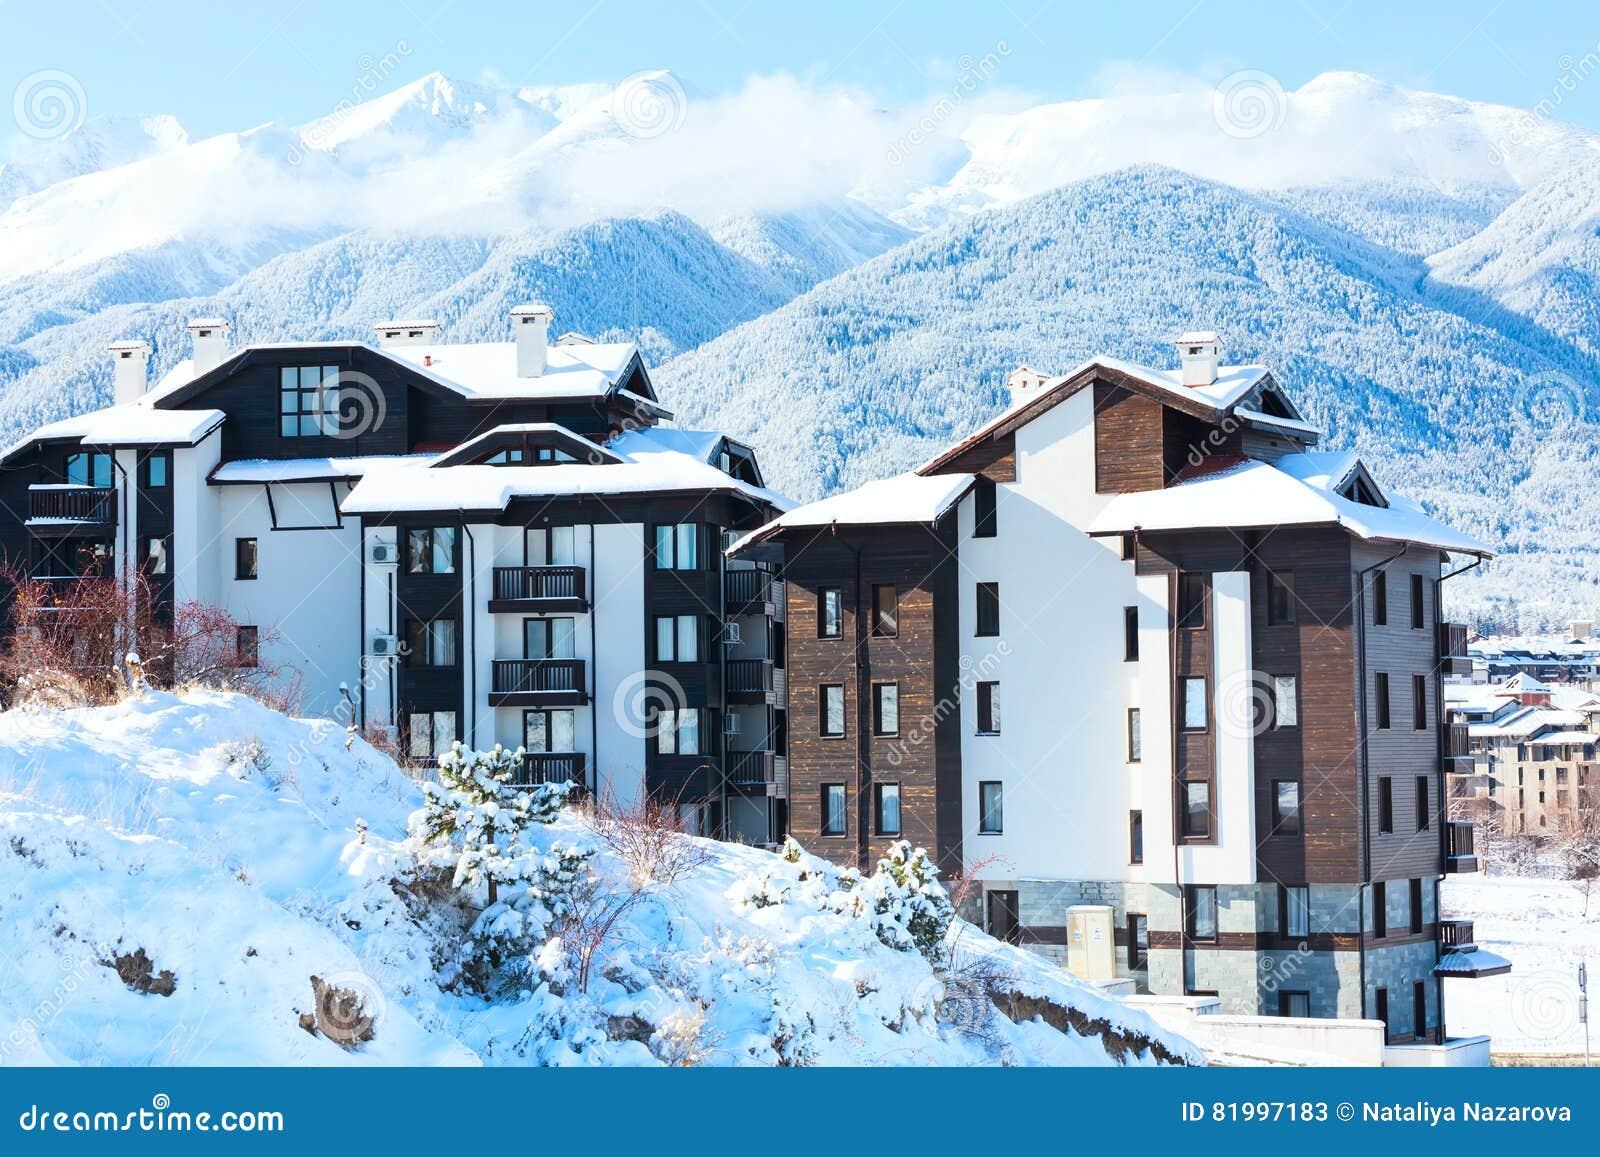 Houses And Snow Mountains Panorama In Bulgarian Ski Resort